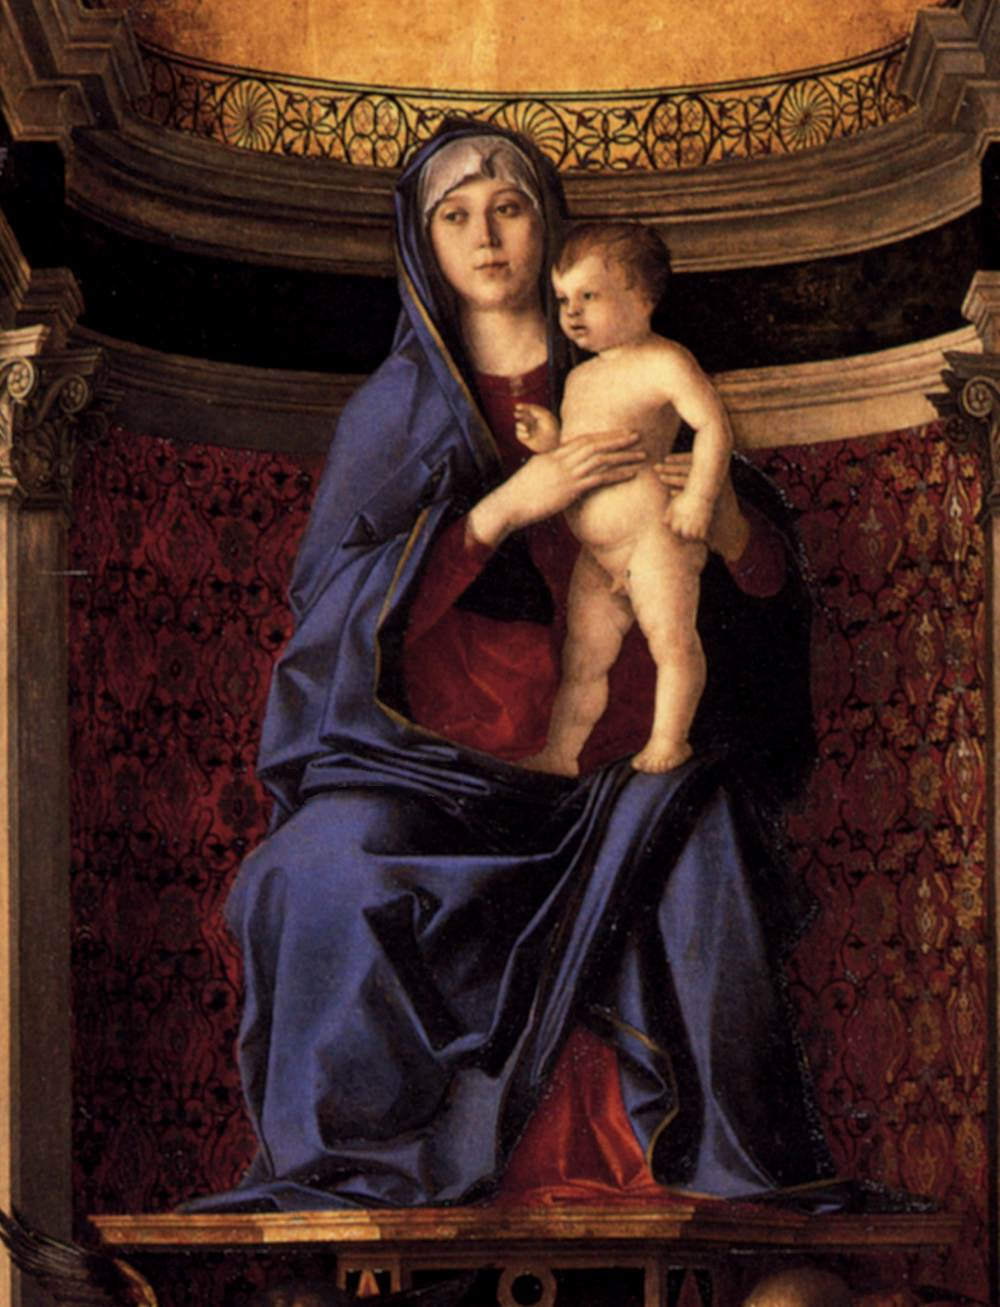 http://www.lib-art.com/imgpainting/9/0/6809-frari-triptych-giovanni-bellini.jpg